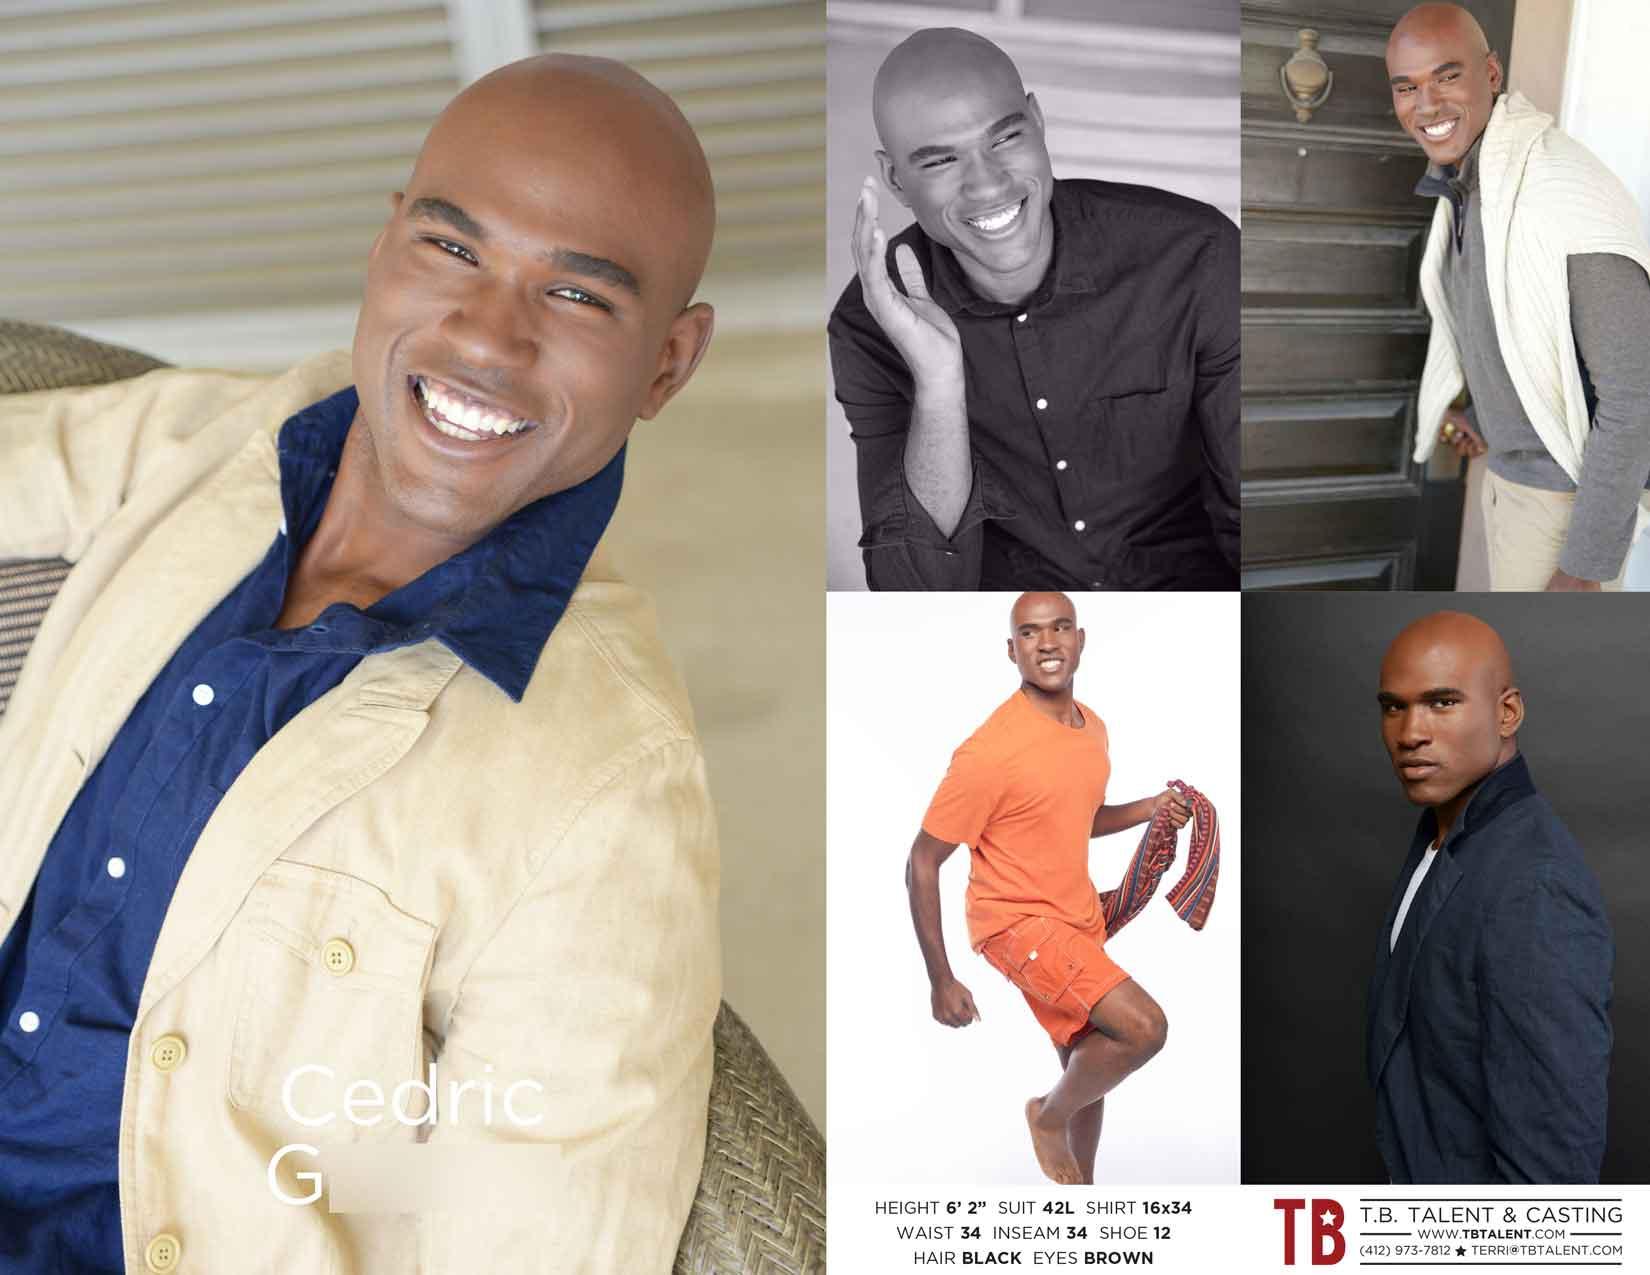 Talent Cedric G. TBTalent.com